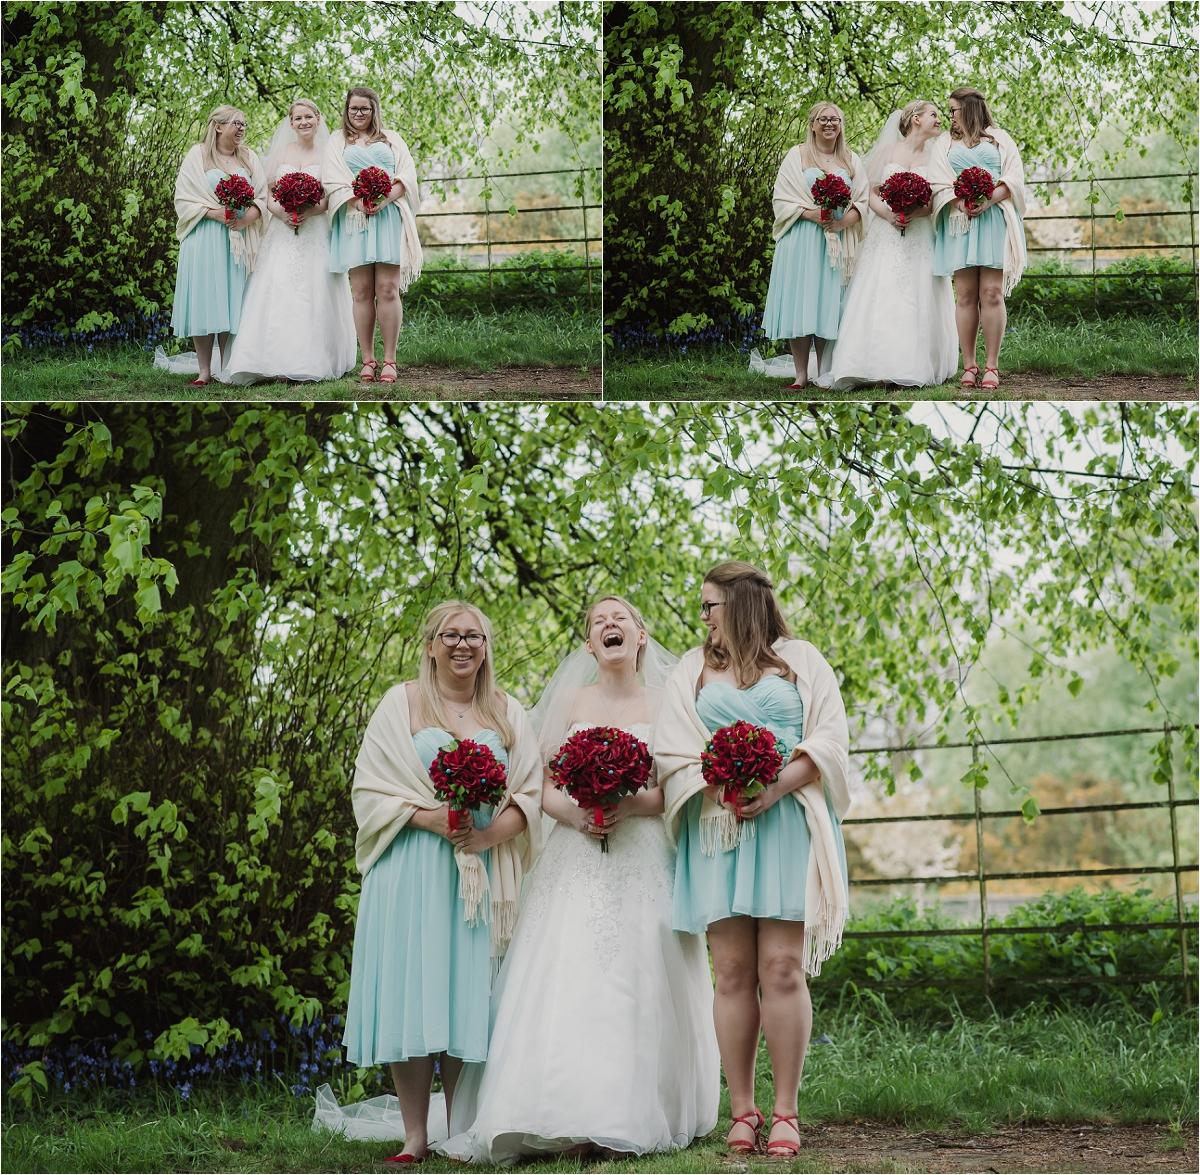 dan_emma_wedding_0057.jpg